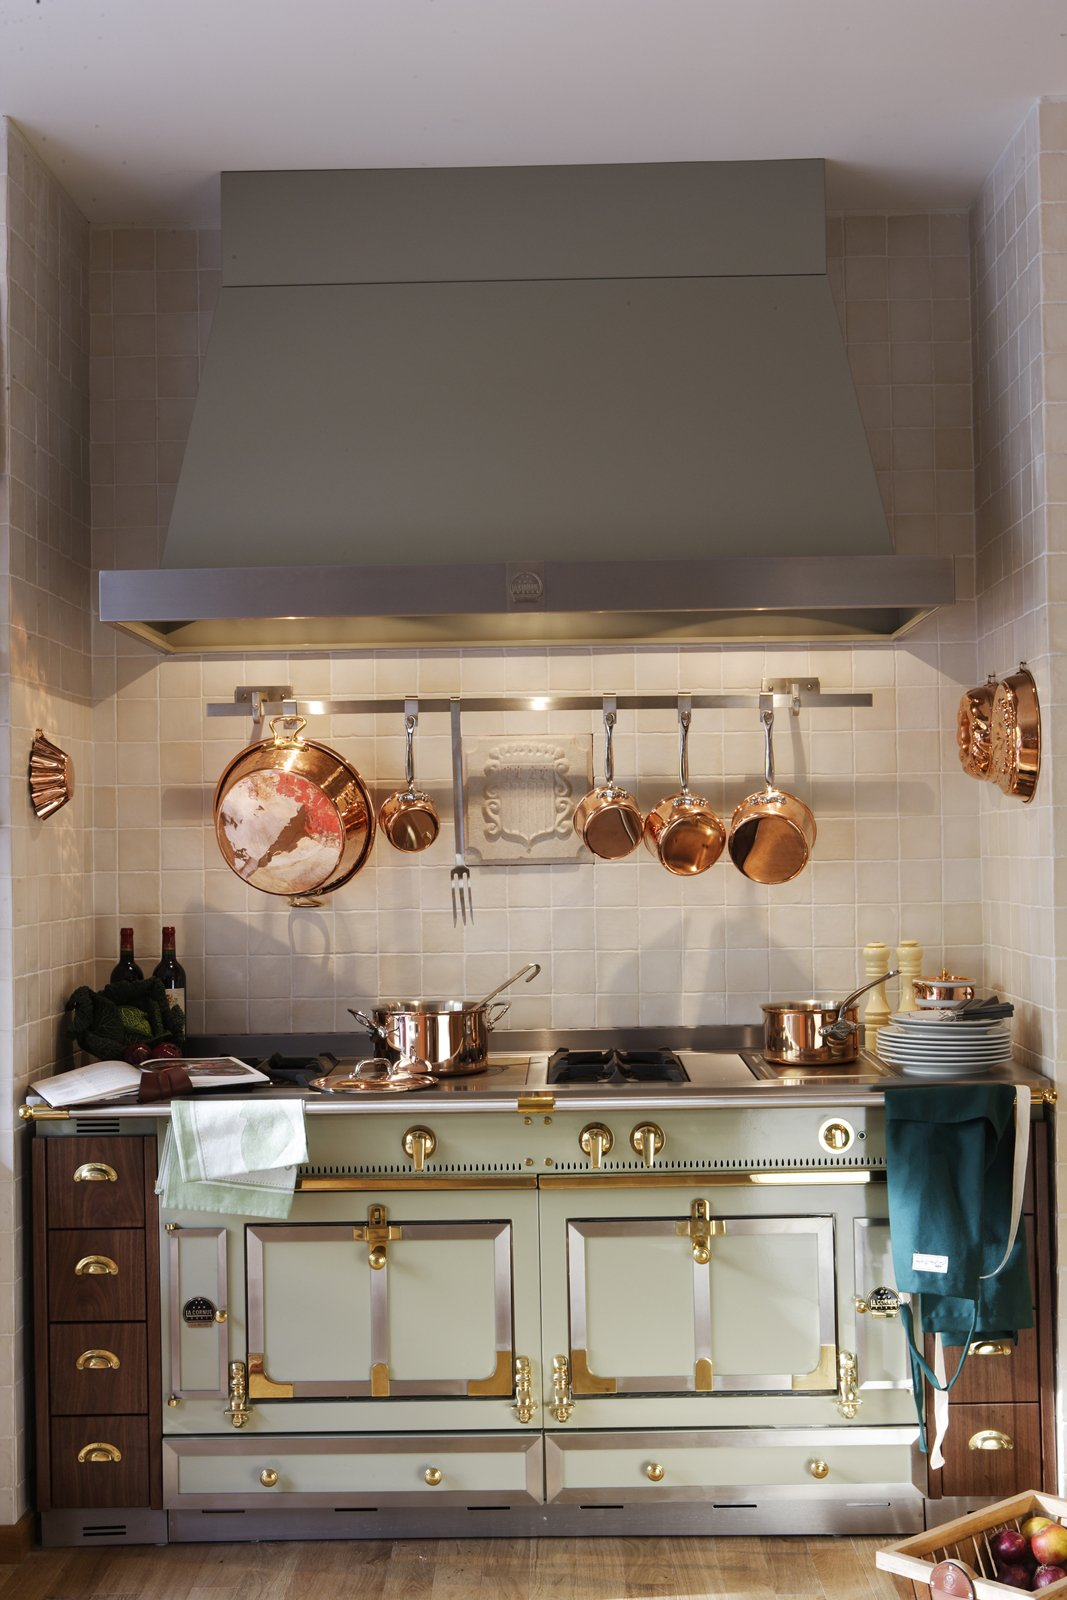 cucine country una scelta di stile cose di casa. Black Bedroom Furniture Sets. Home Design Ideas